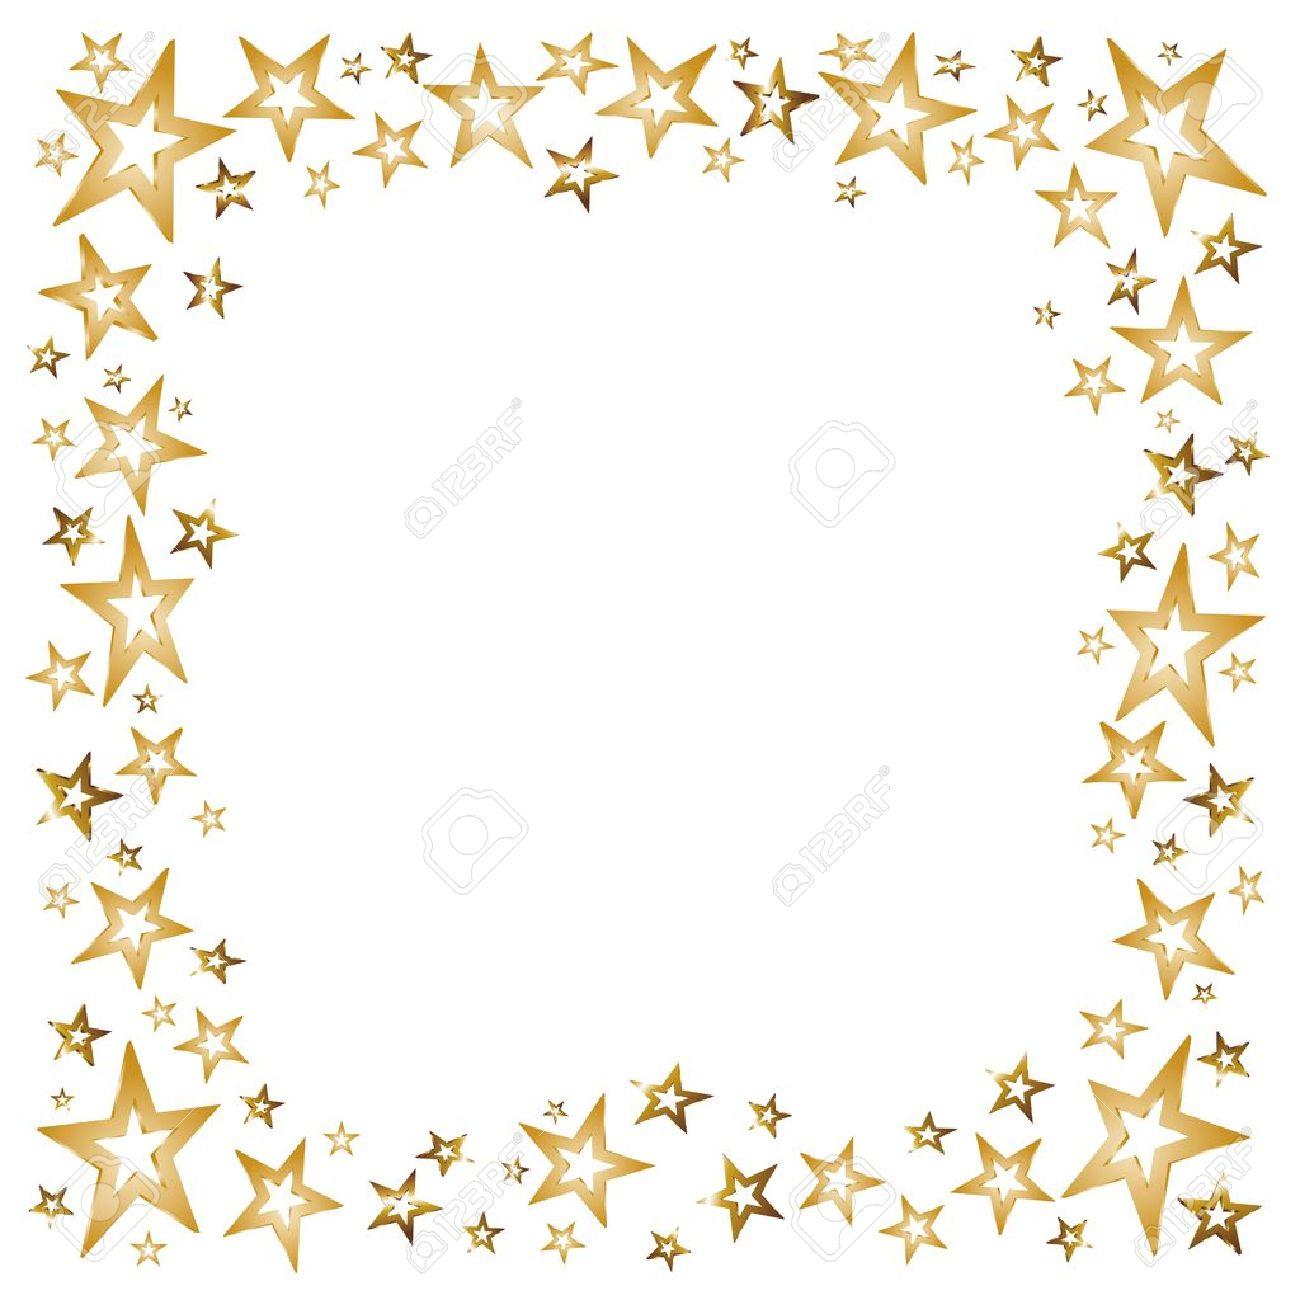 Free Gold Star Border Transparent, Download Free Clip Art.